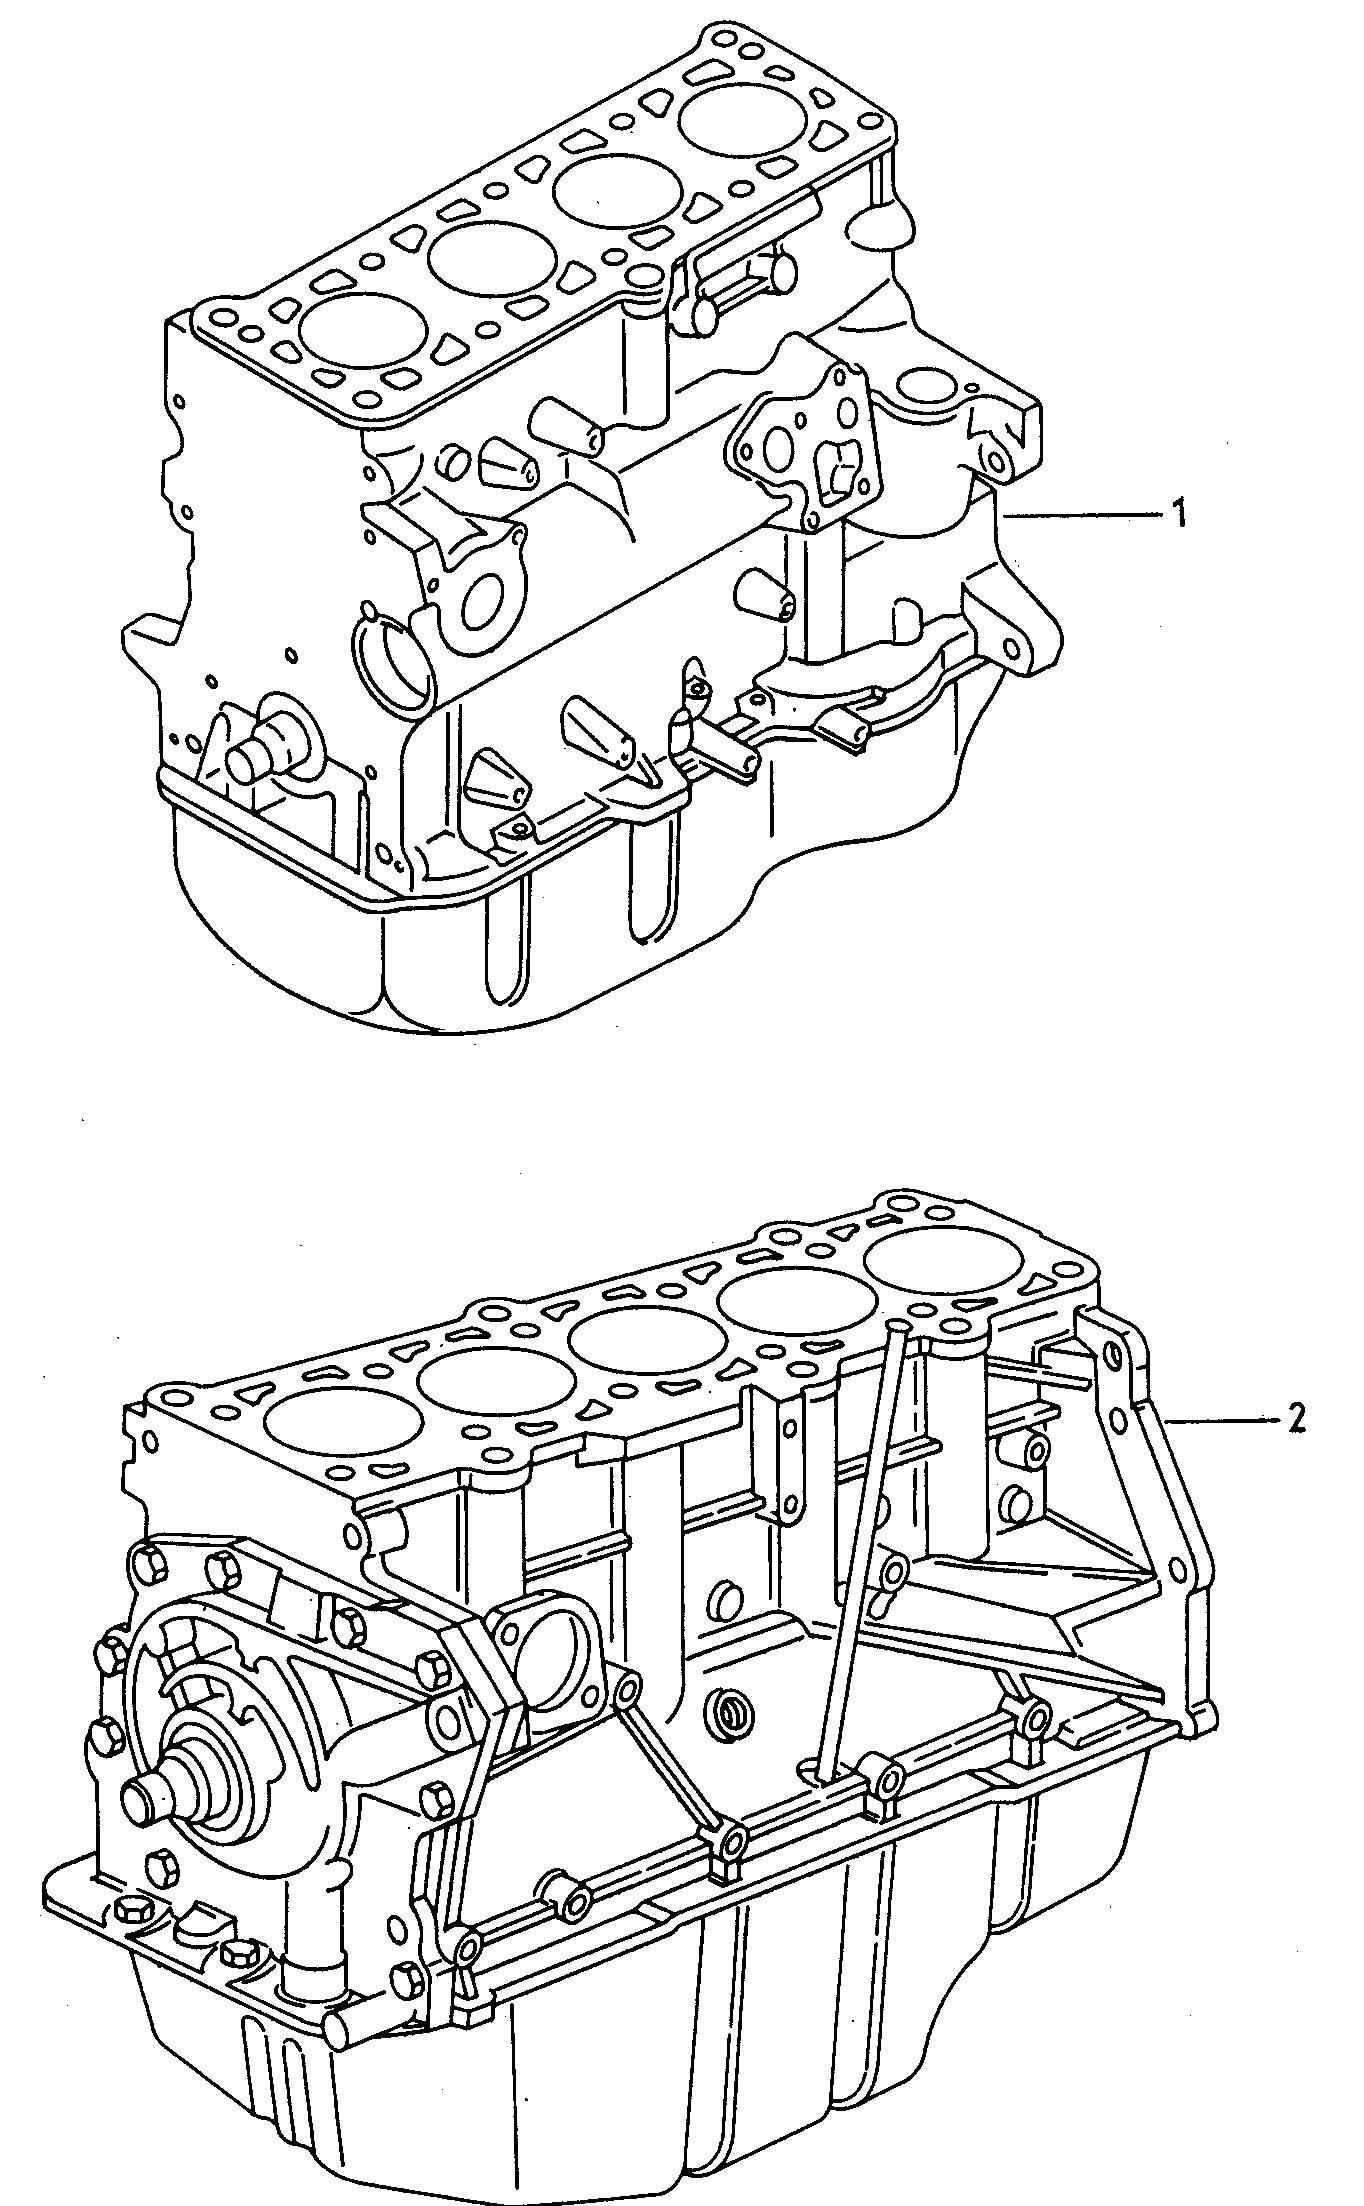 Volkswagen Vw Golf Base Engine Without Distribu